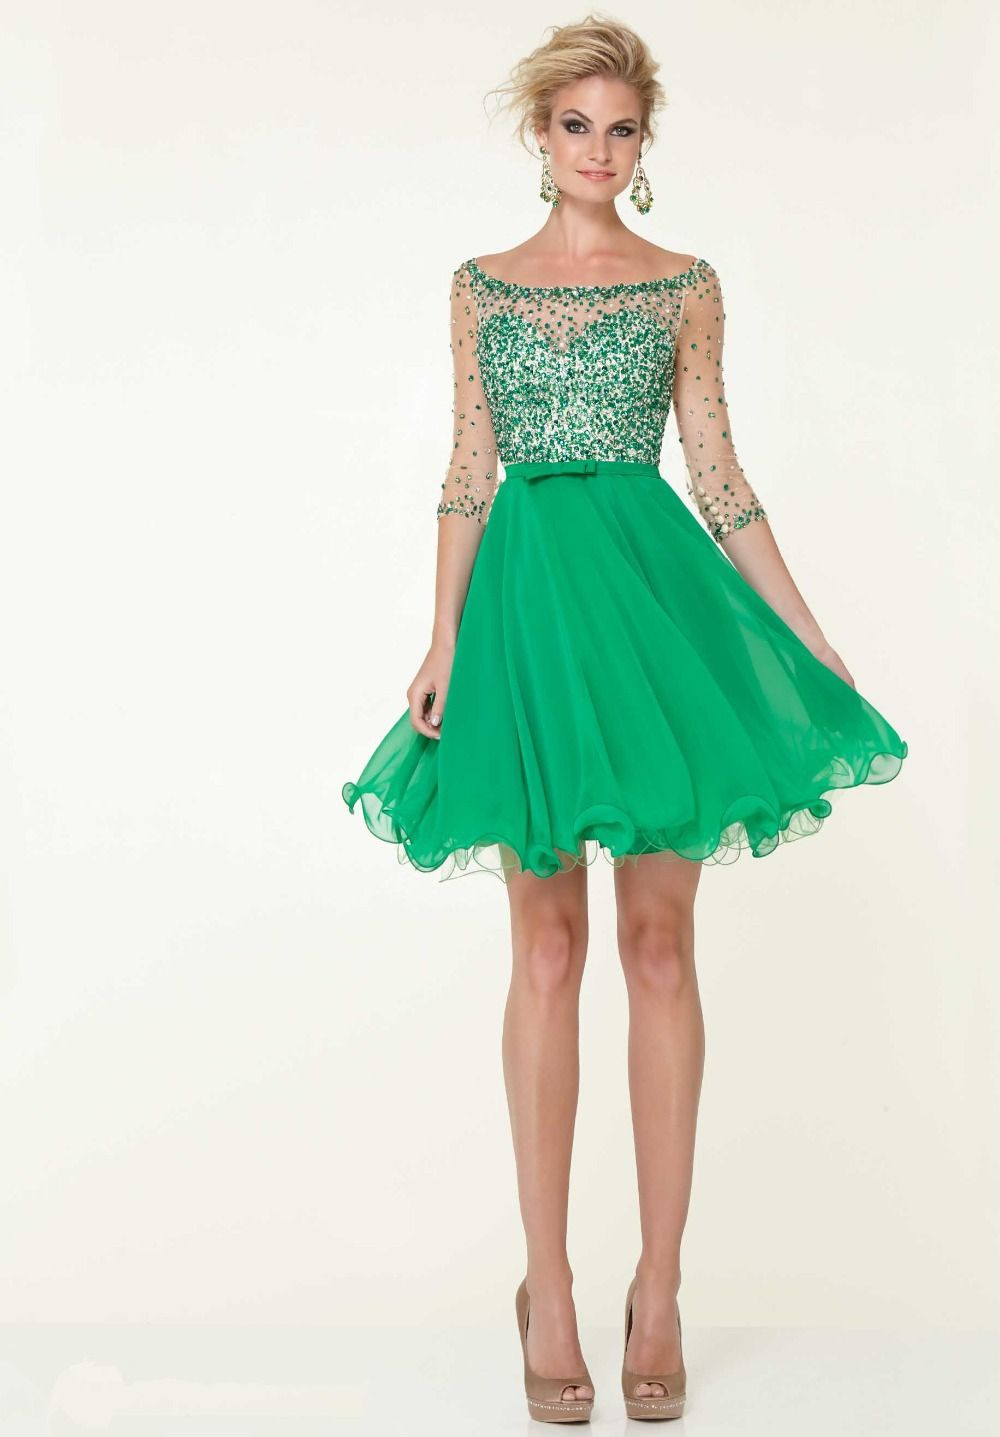 3 4 length evening dresses juniors | Color dress | Pinterest ...